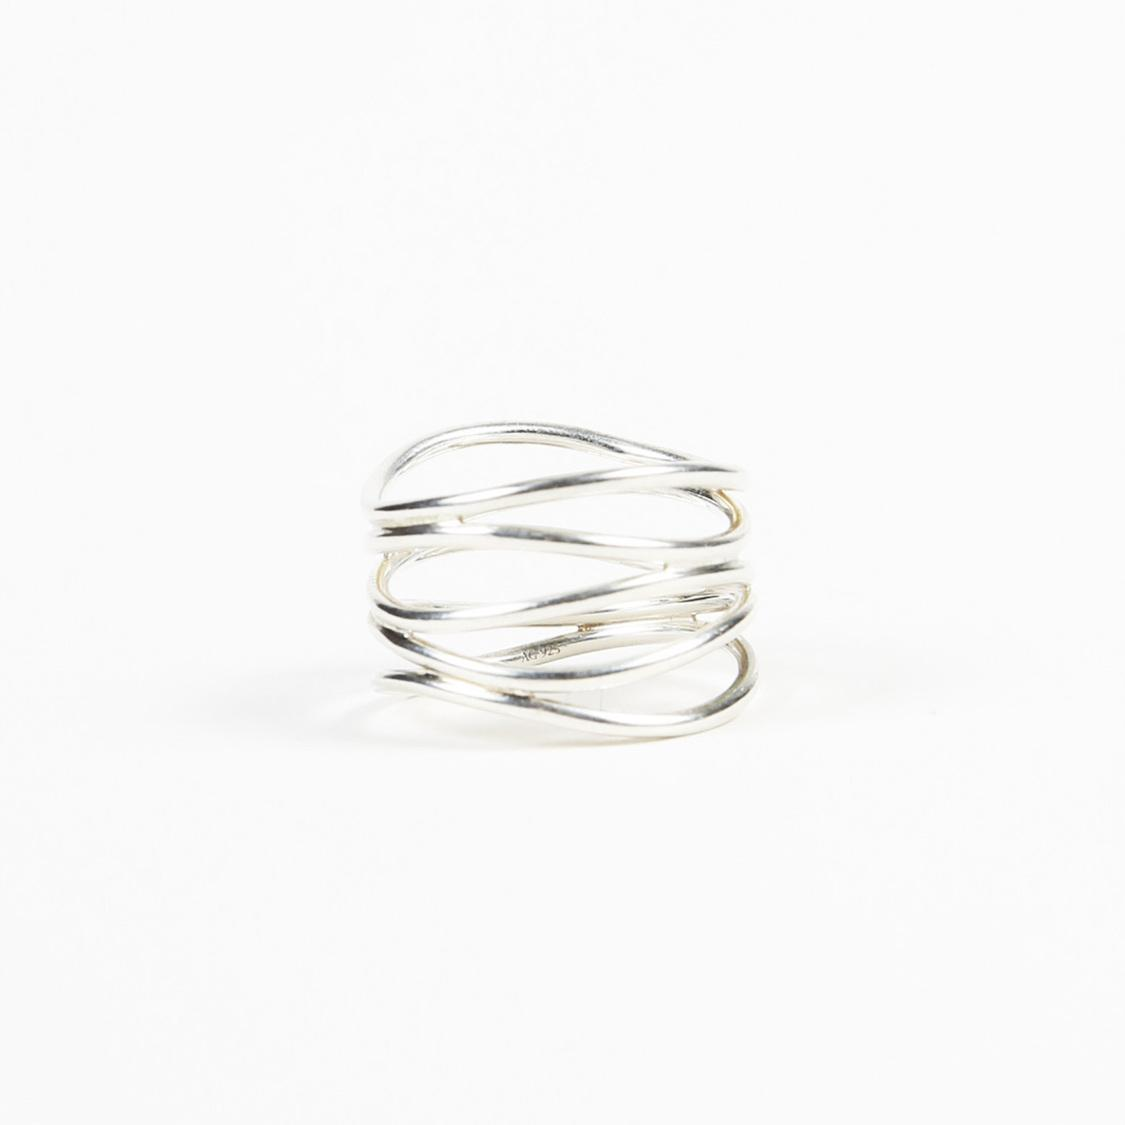 b26c2bfb3 Tiffany & Co. X Elsa Peretti Sterling Silver